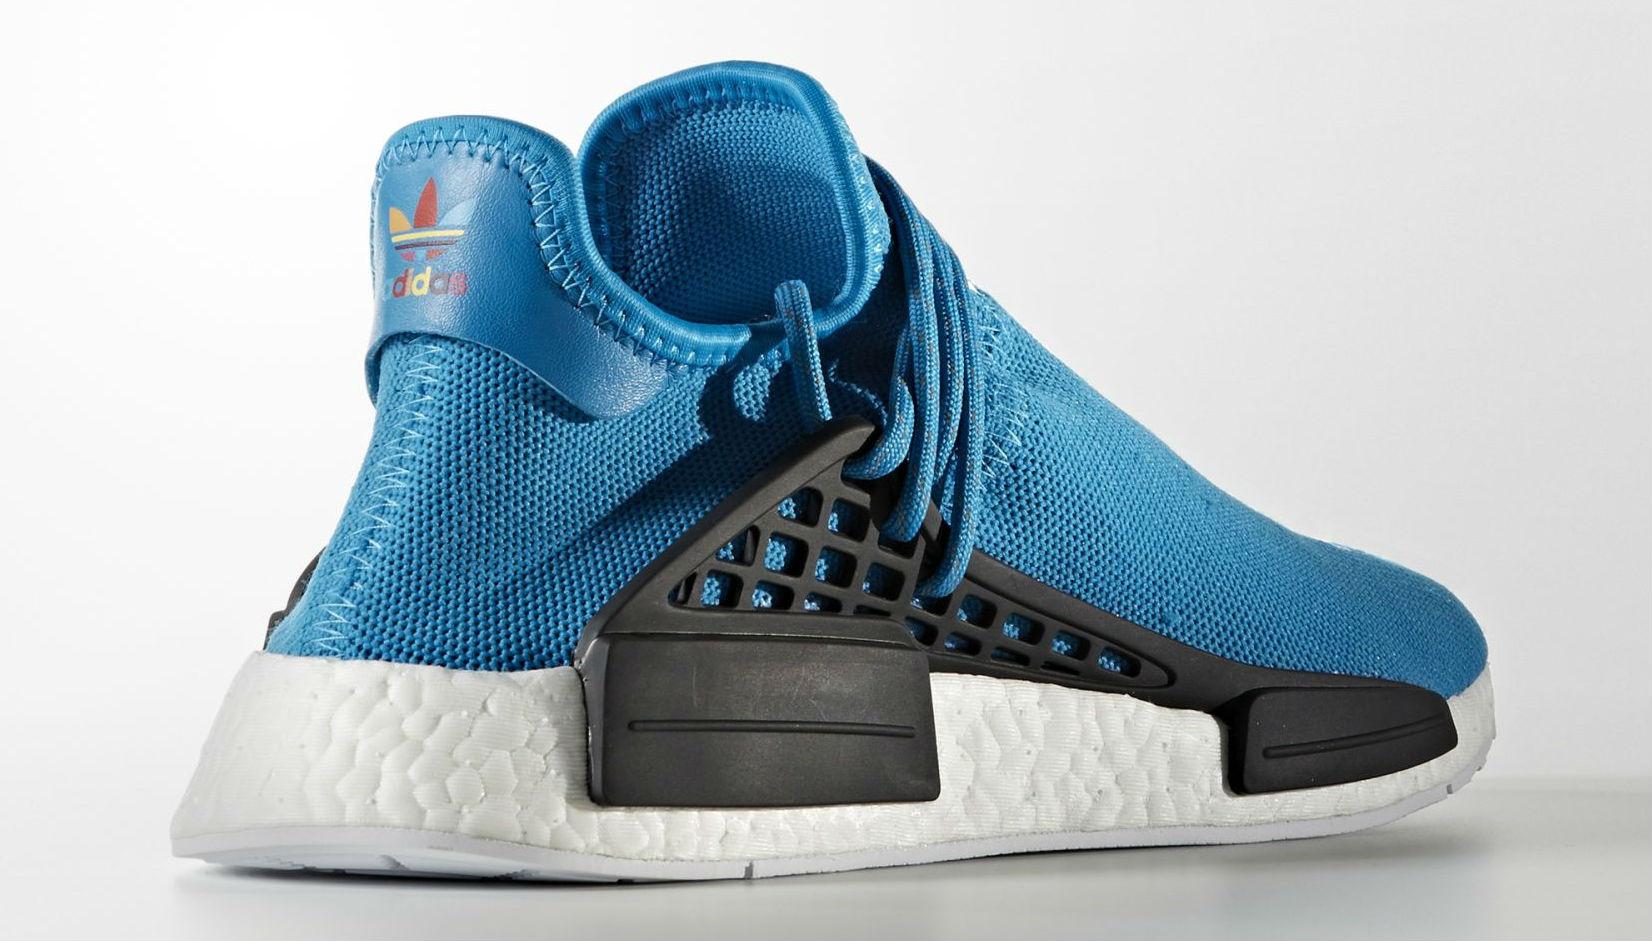 b45eb1290 Blue Pharrell adidas NMD Human Race Lateral